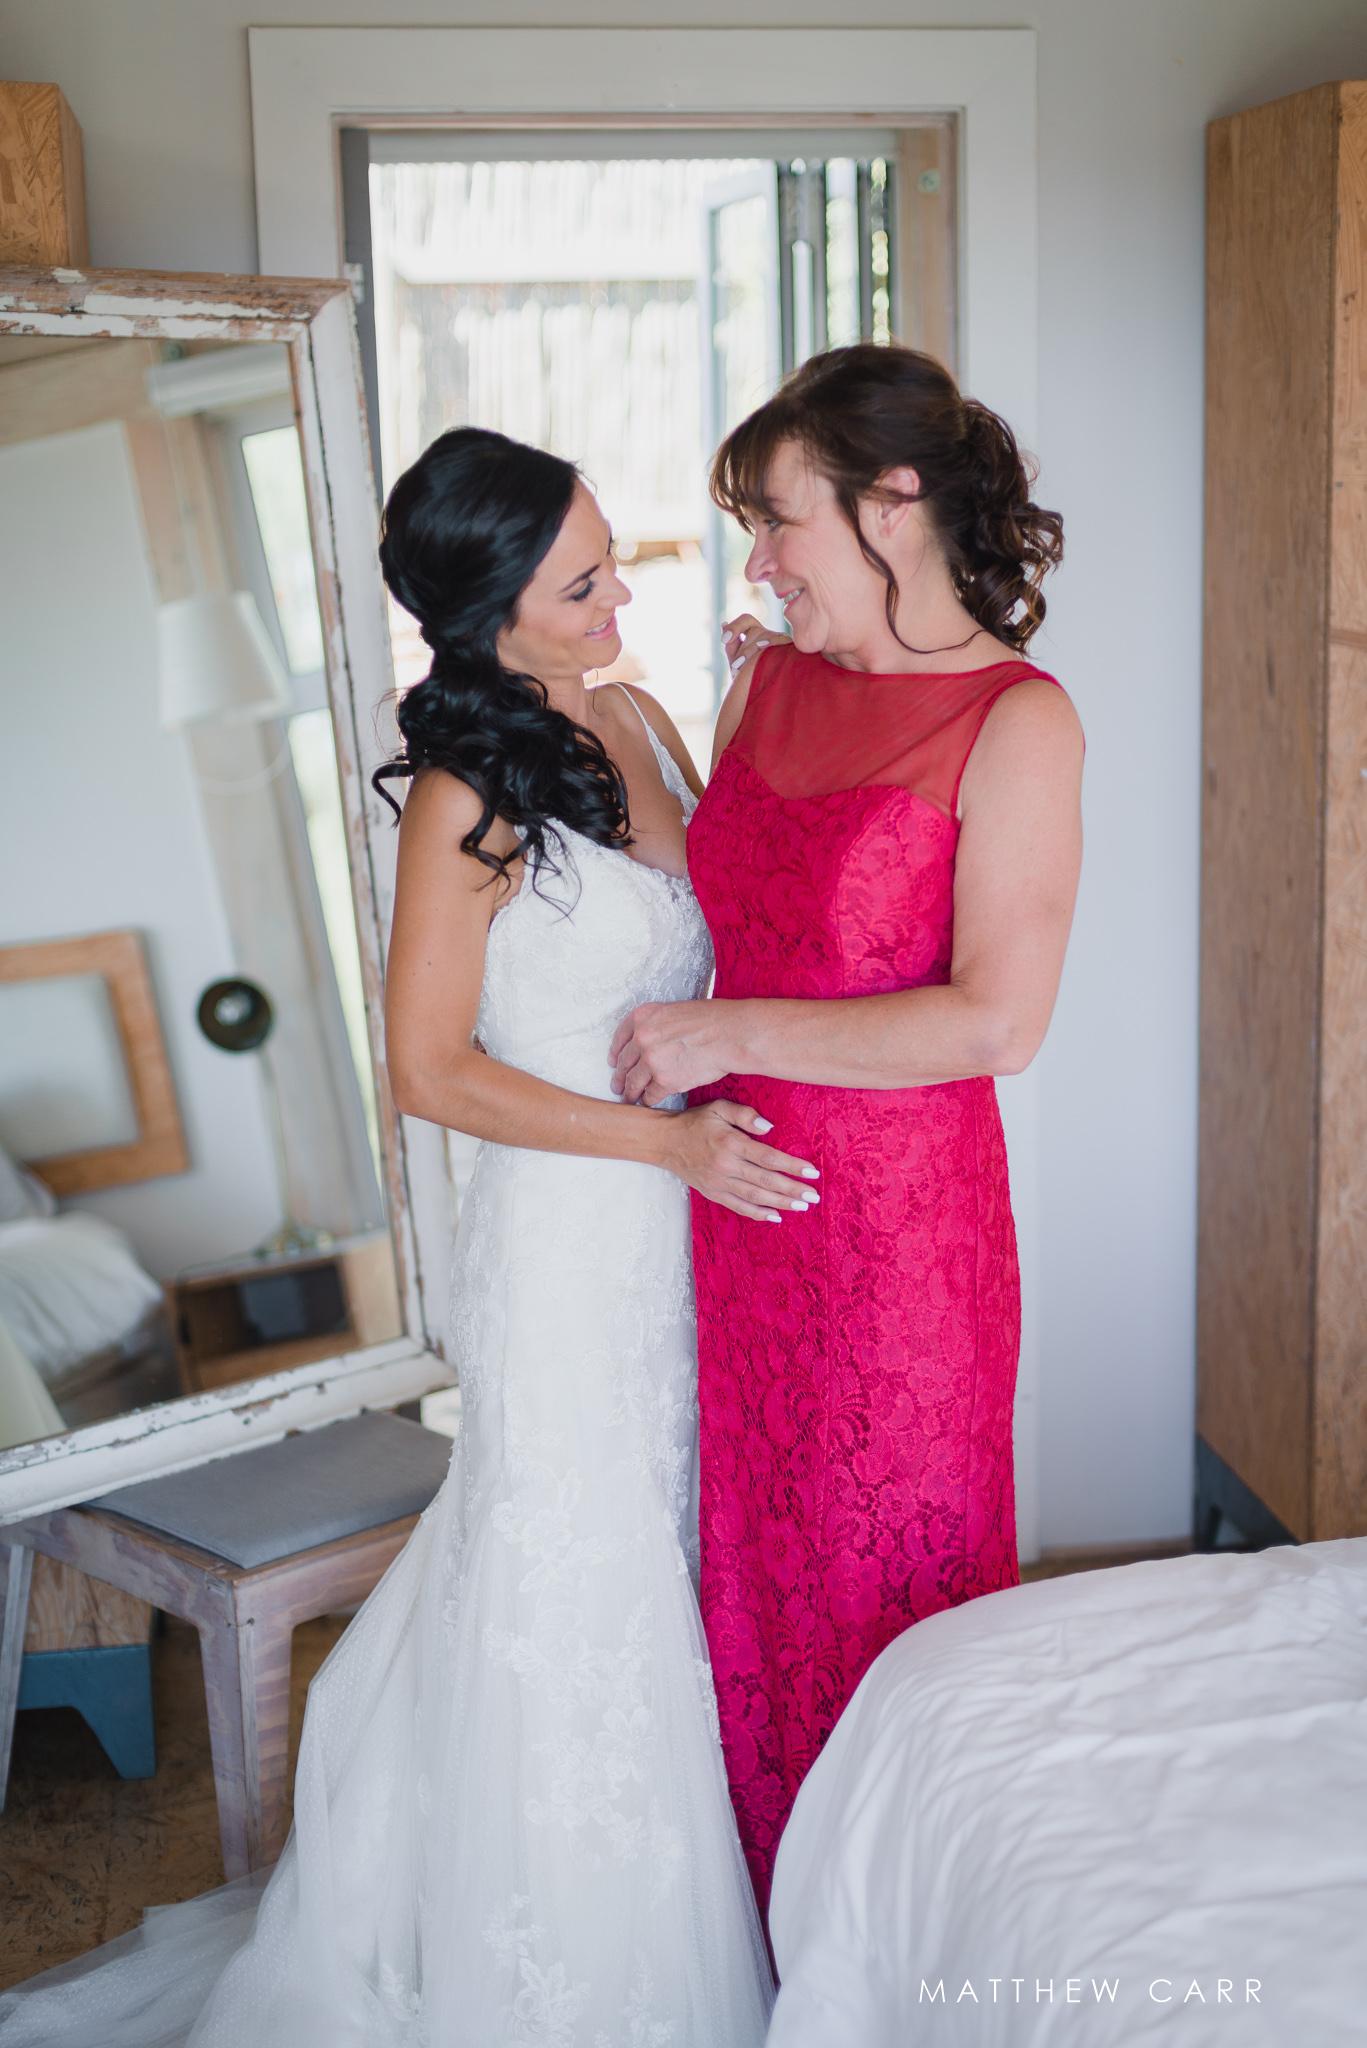 wedding prep - low res (viewing, social media) (237 of 276).JPG